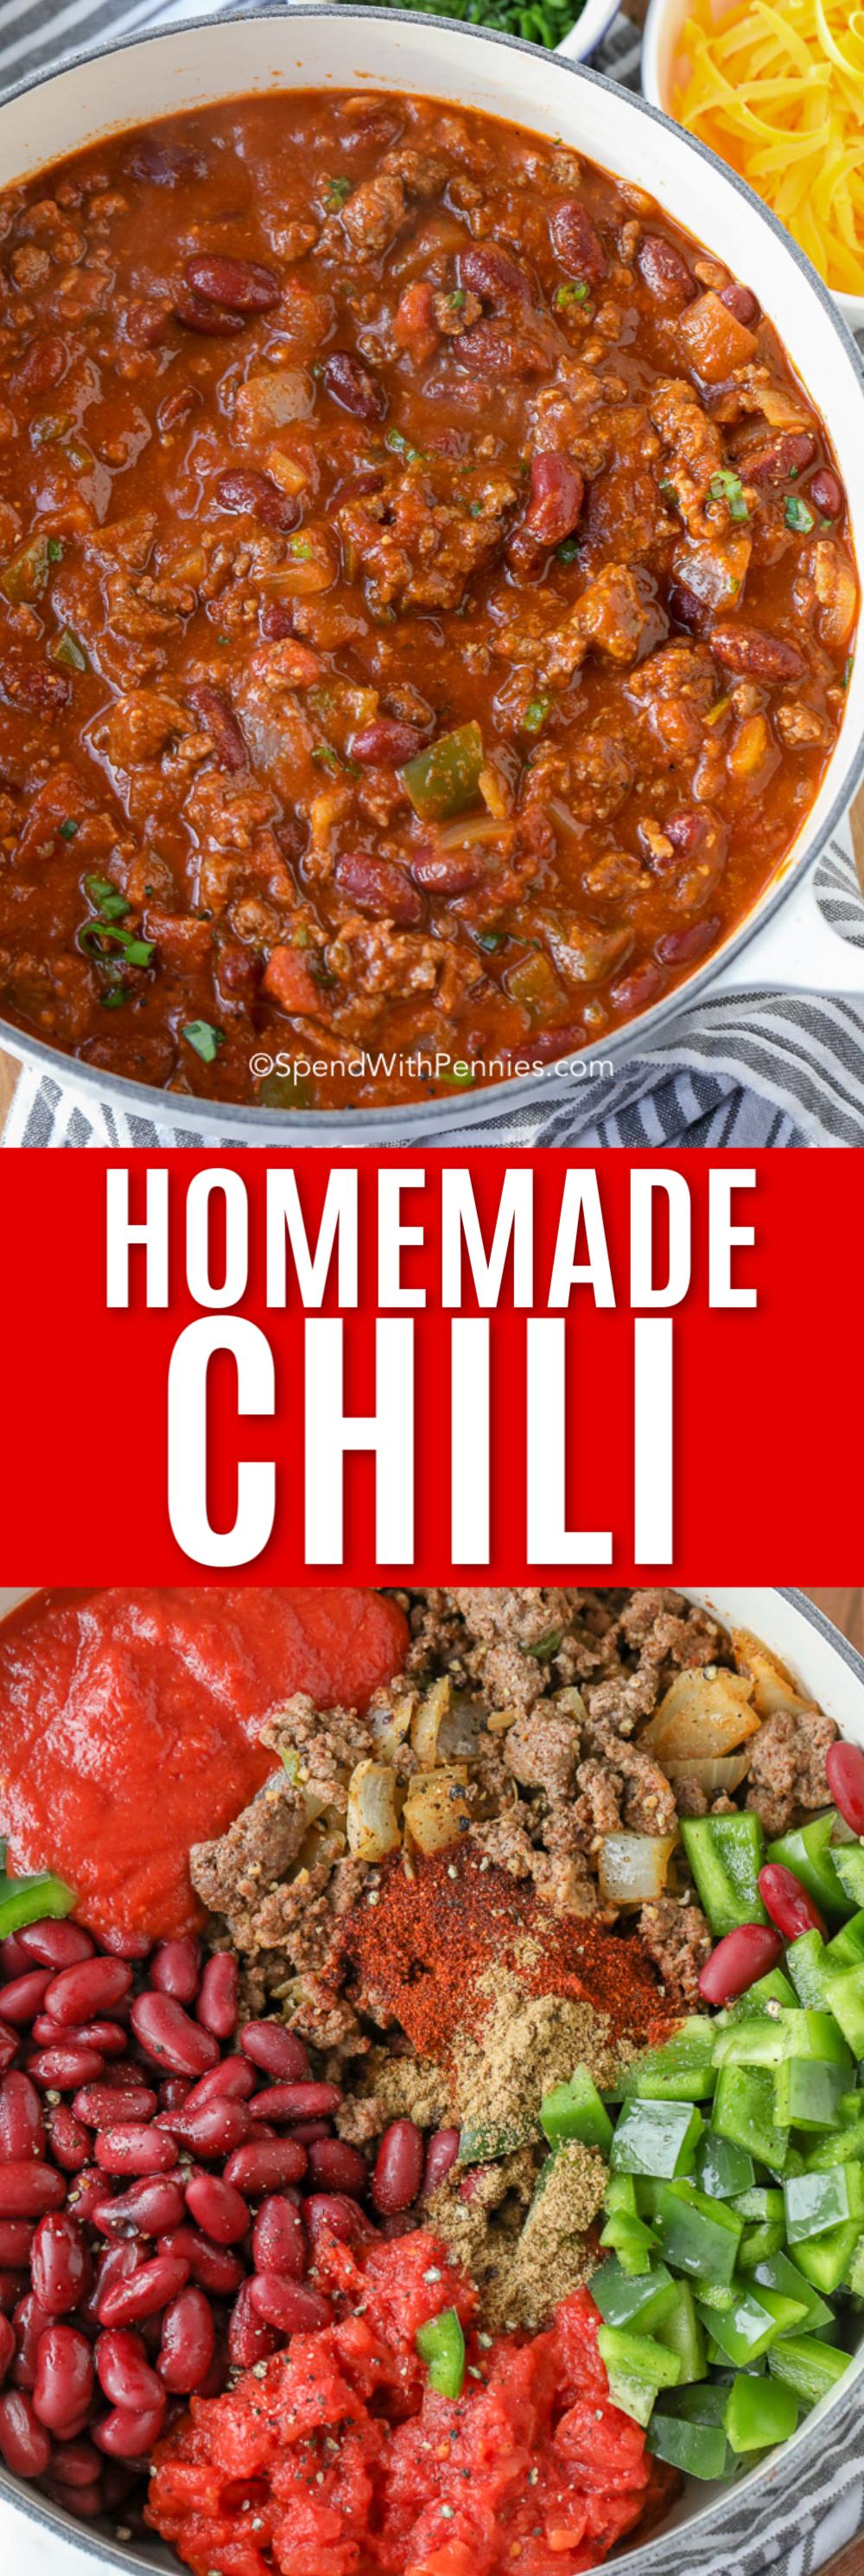 The Best Chili Recipe Chili Recipe Easy Best Chili Recipe Ground Beef Chili Recipes